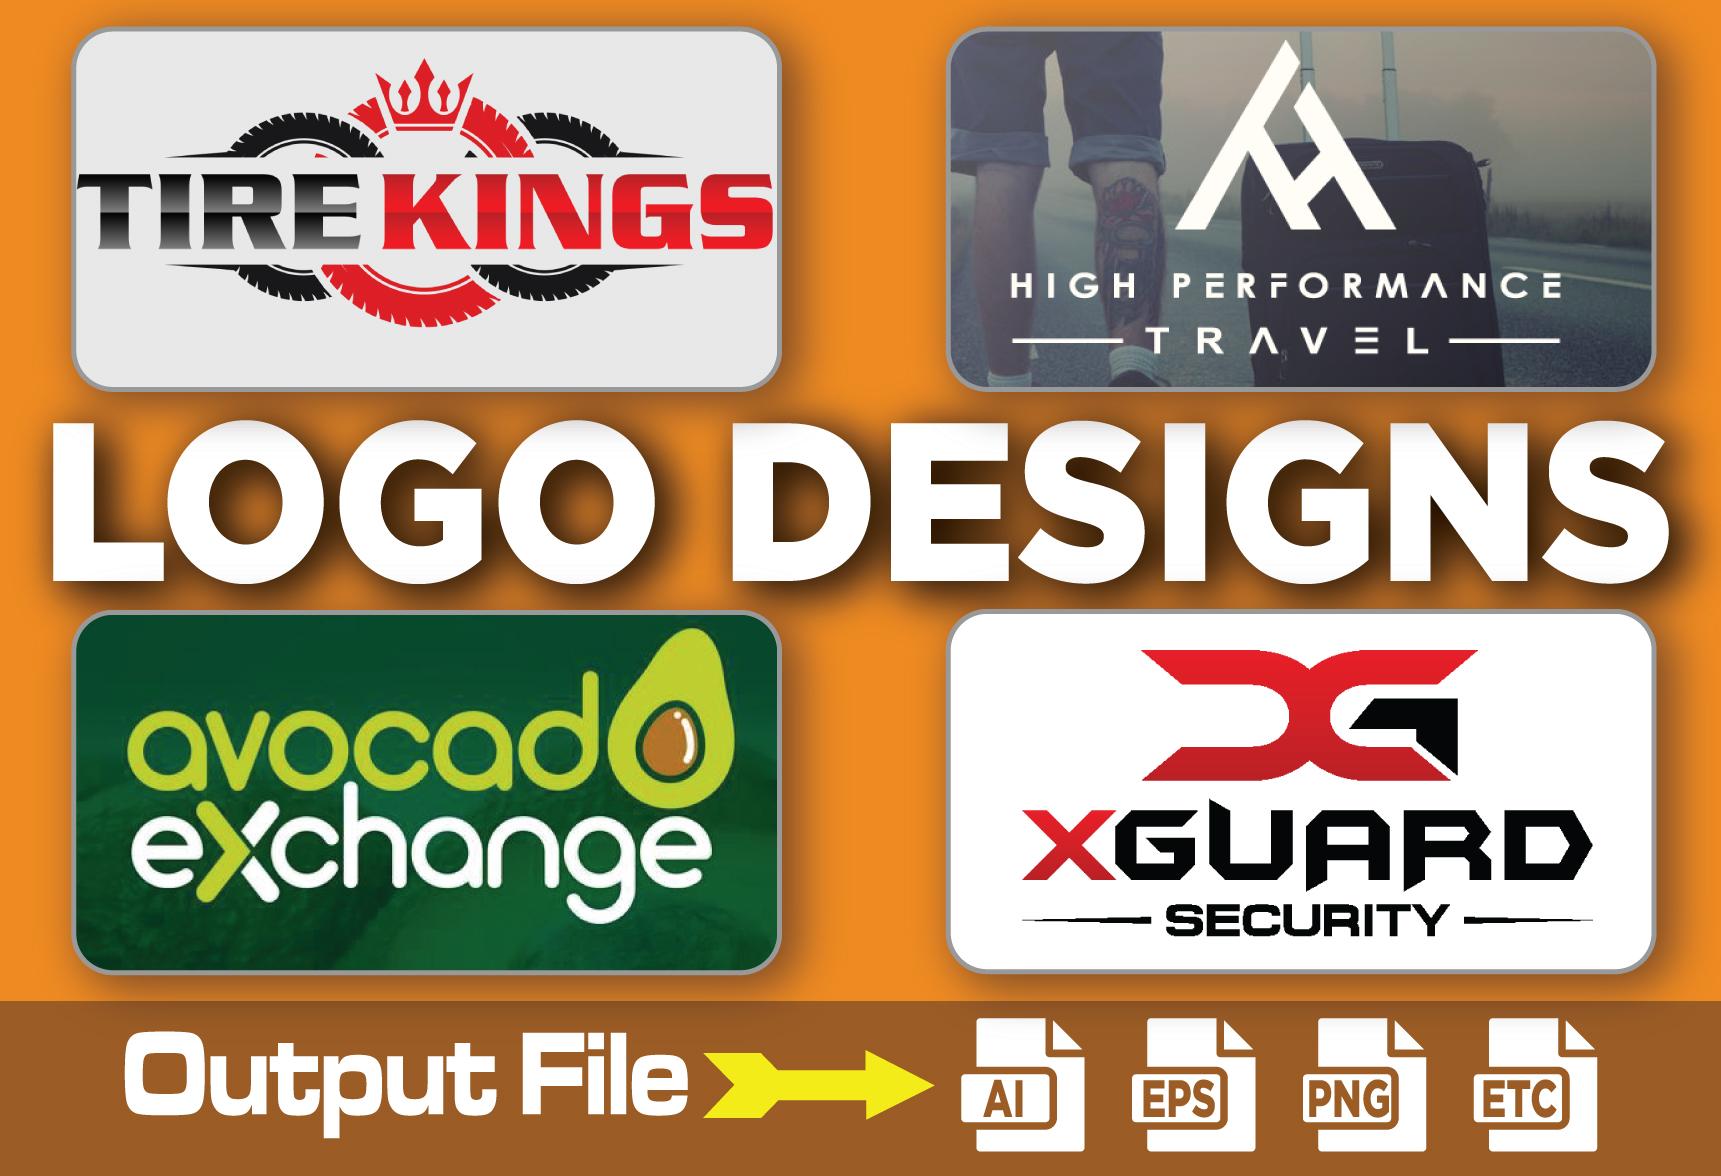 i will design flat,  minimalist,  coraporative logo design with copyright